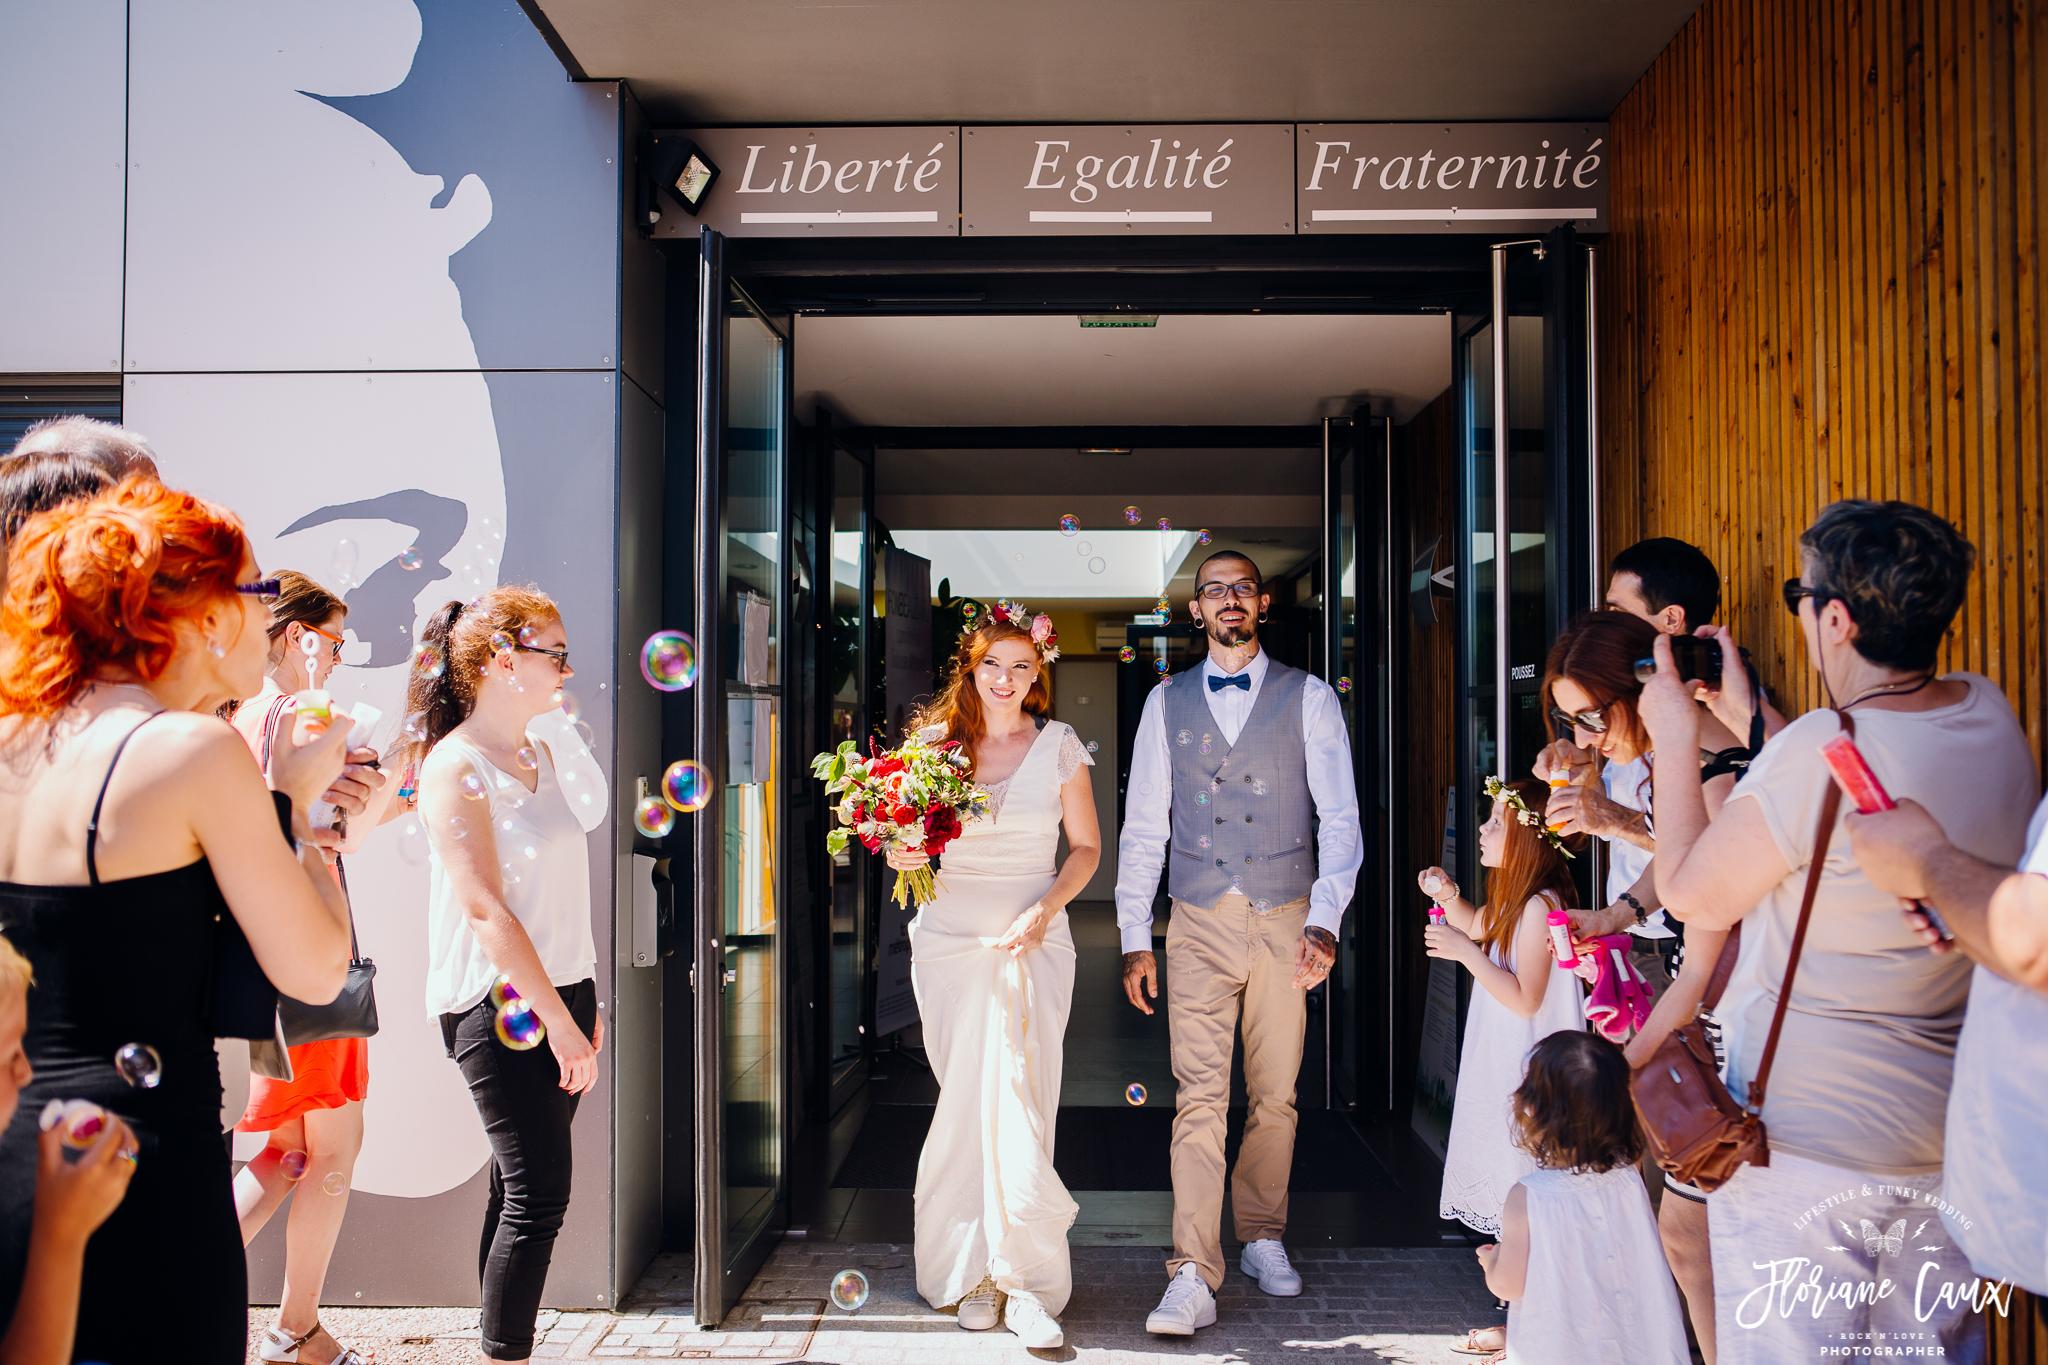 photographe-mariage-toulouse-rocknroll-maries-tatoues-floriane-caux-38